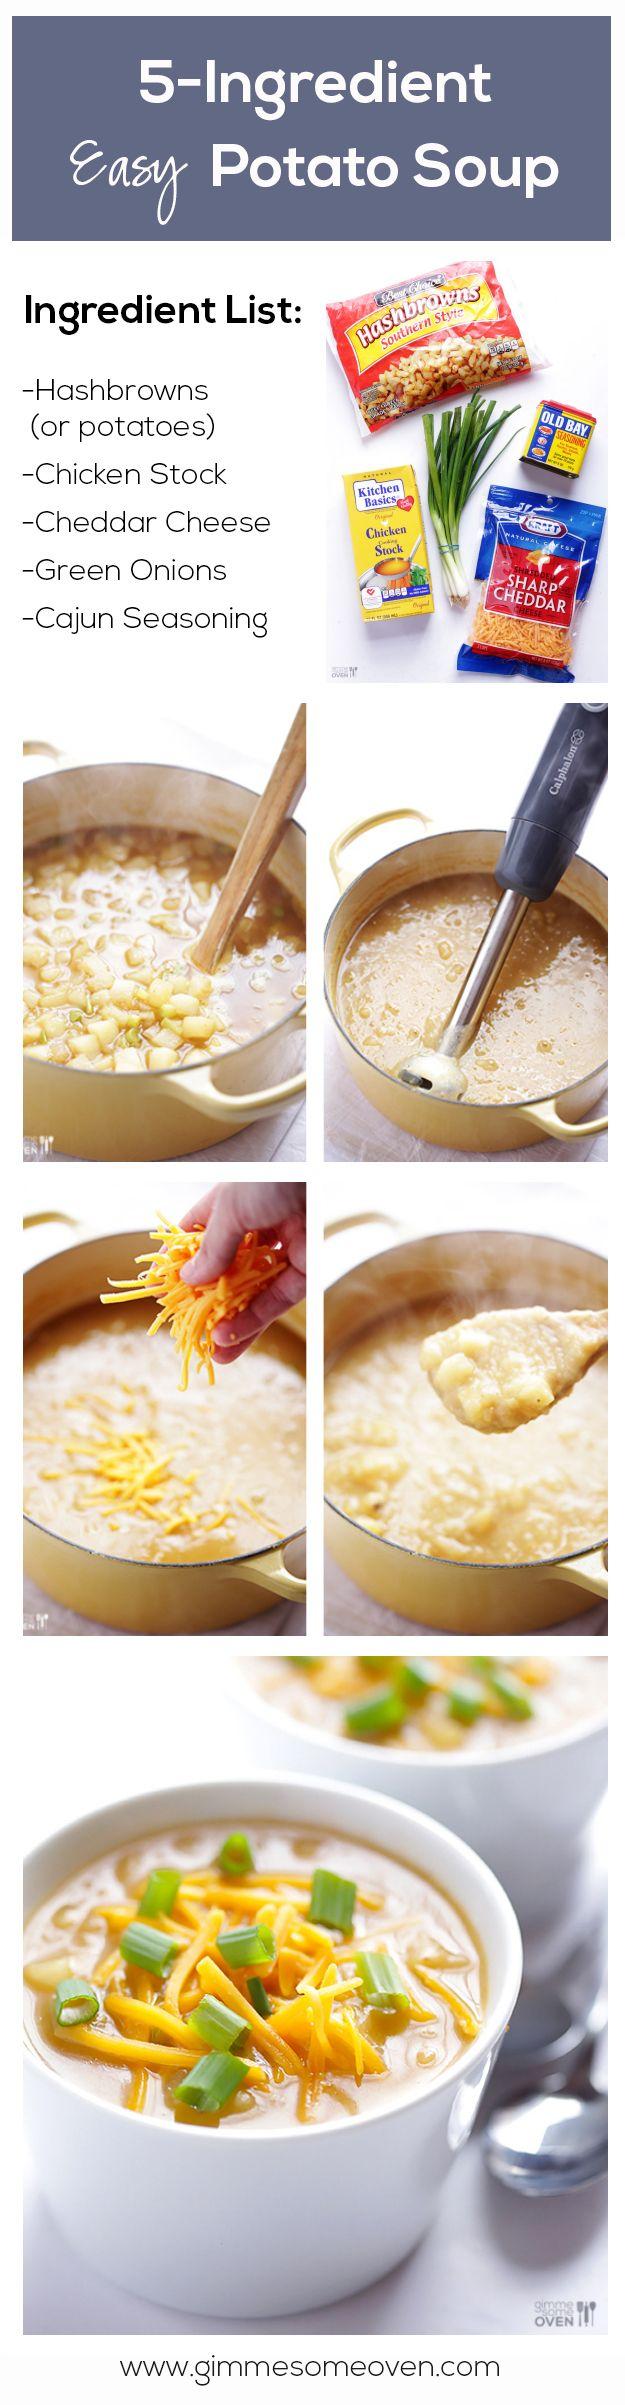 5-Ingredient Potato Soup Recipe